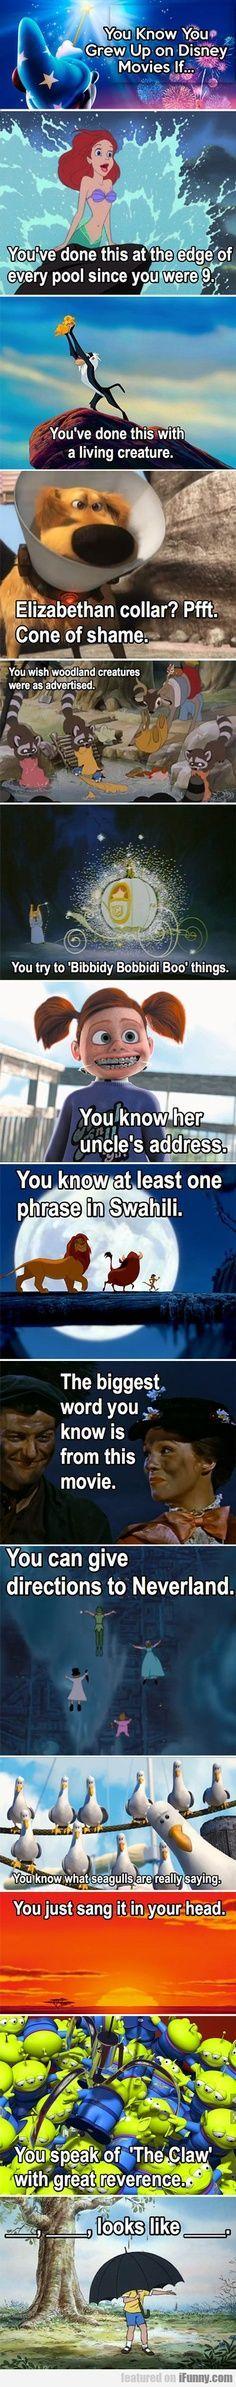 I want my kids to grow up on Disney movies. You know you grew up on Disney movies if. Disney Pixar, Walt Disney World, Film Disney, Disney And Dreamworks, Funny Disney Memes, Disney Facts, Disney Quotes, Pixar Facts, Disney Humor